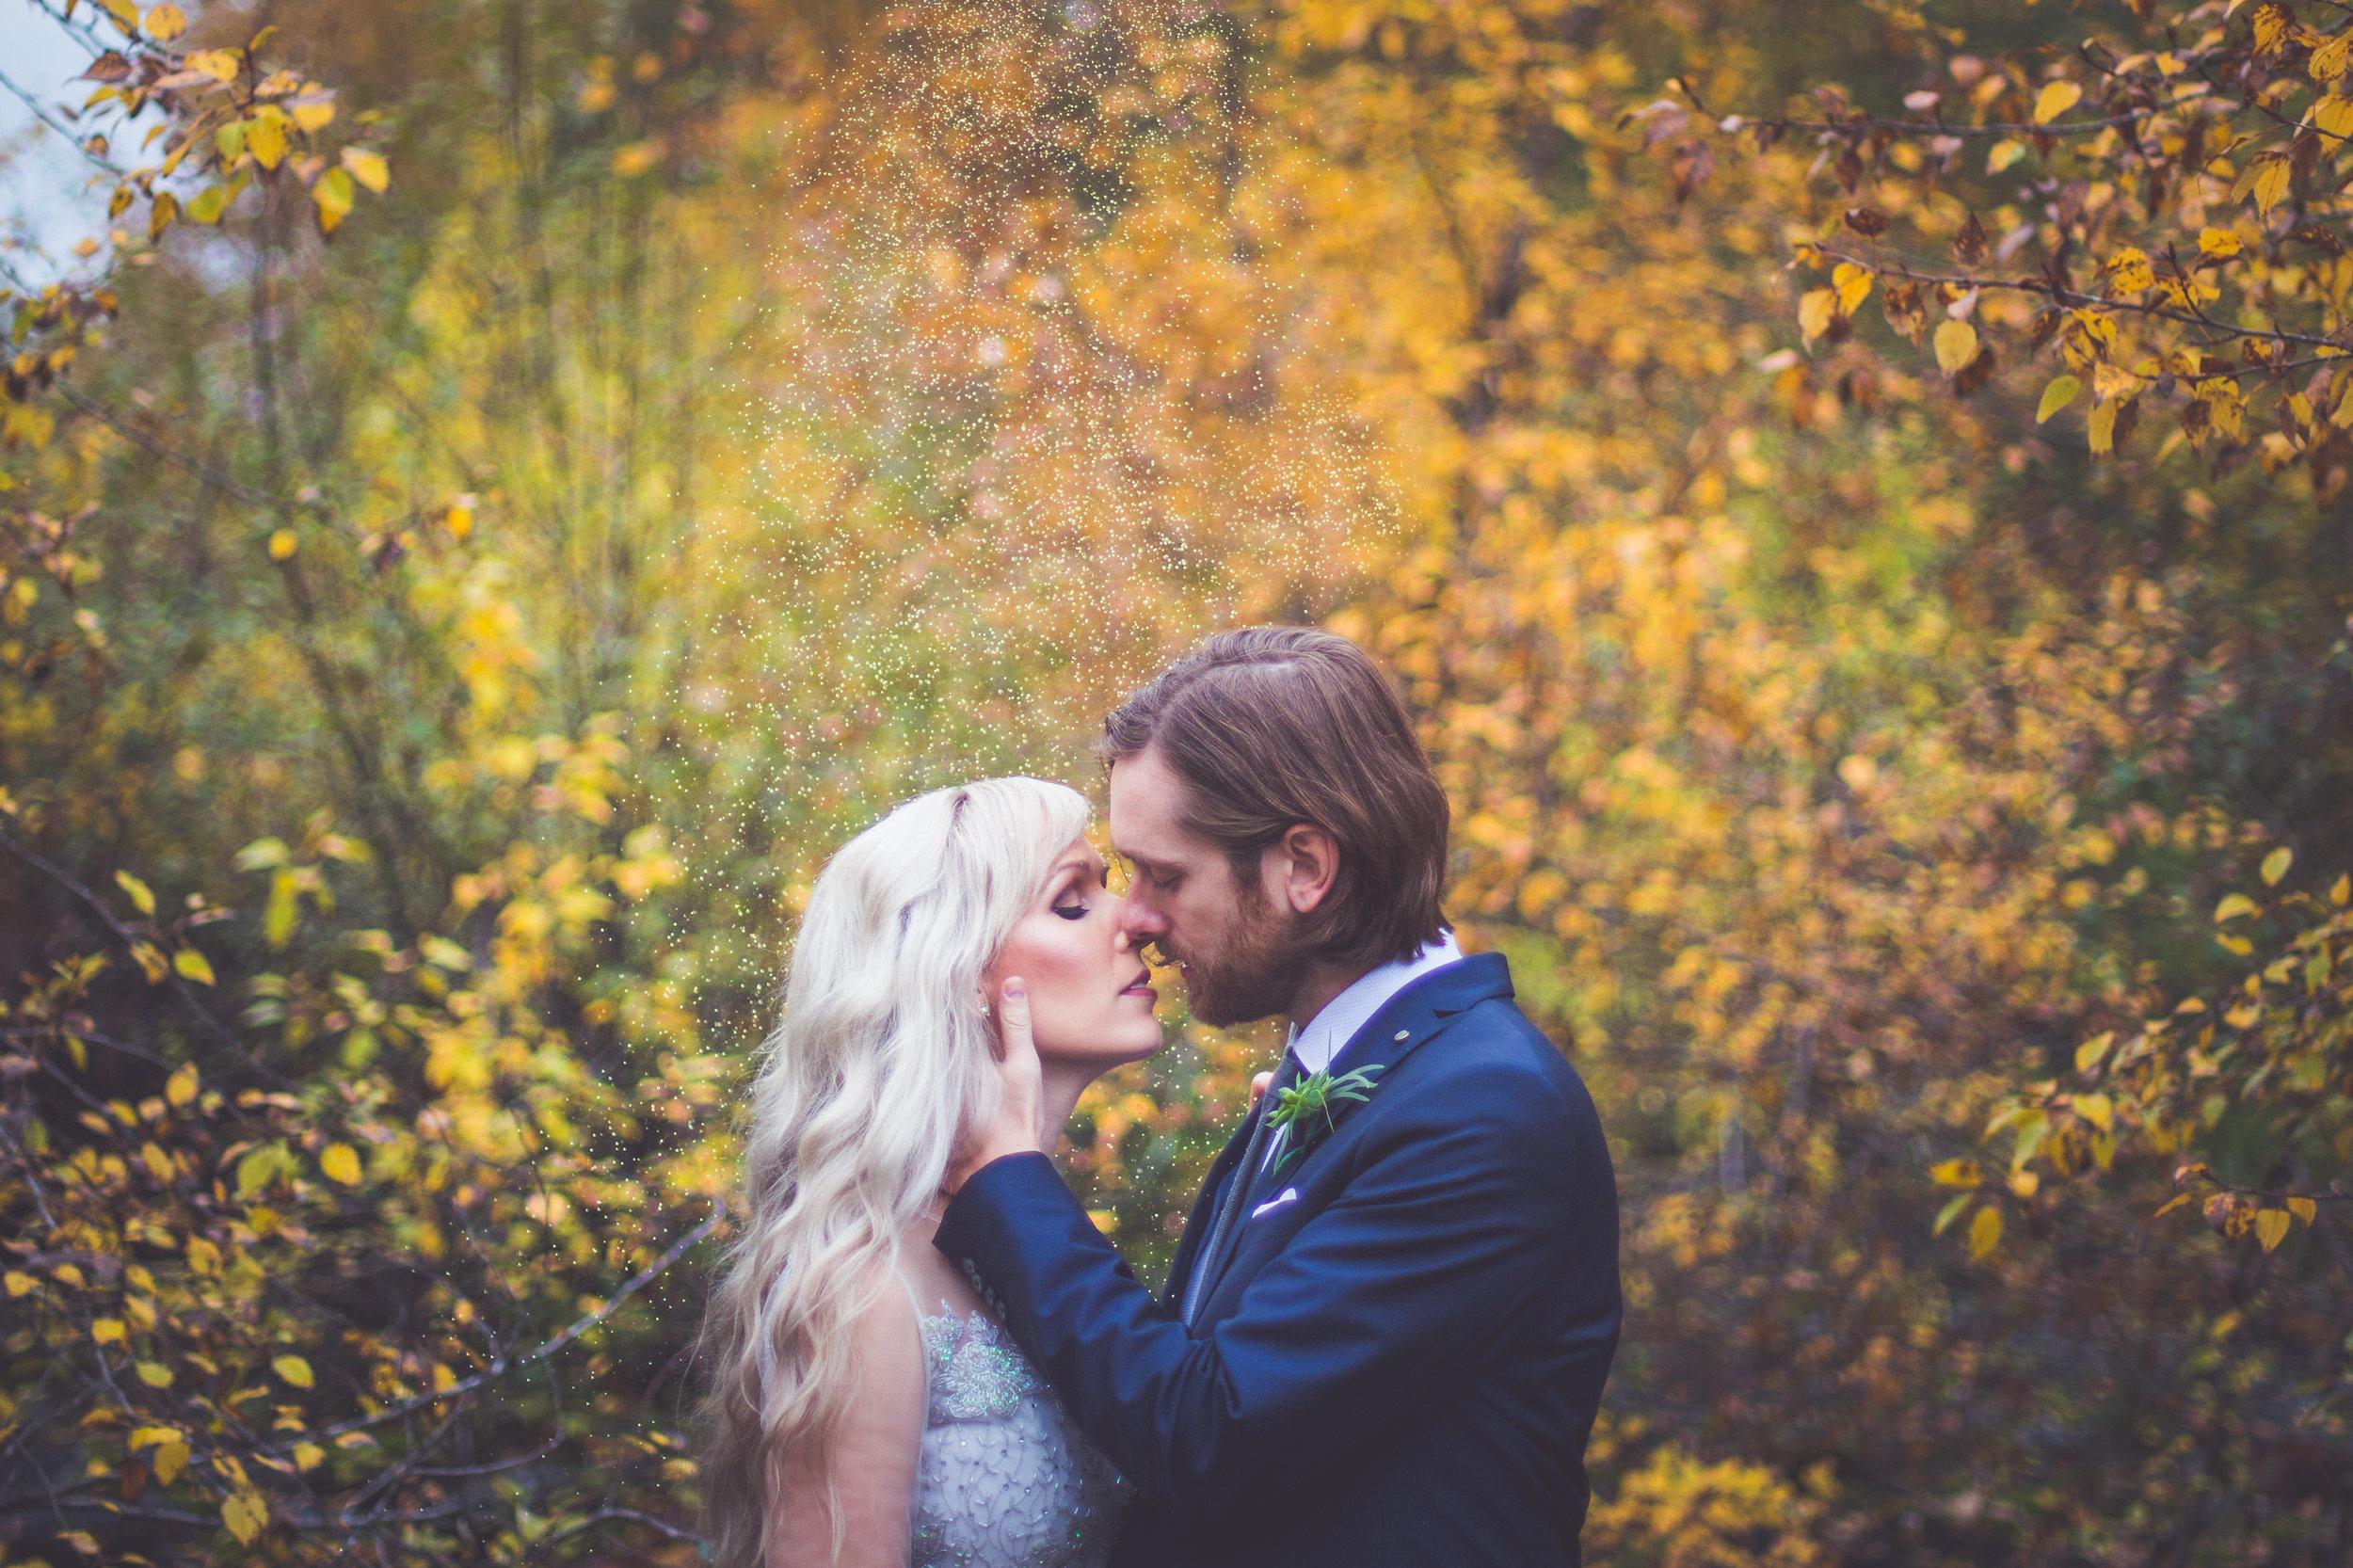 whimsical-romantic-wedding-top-bridge-35.jpg